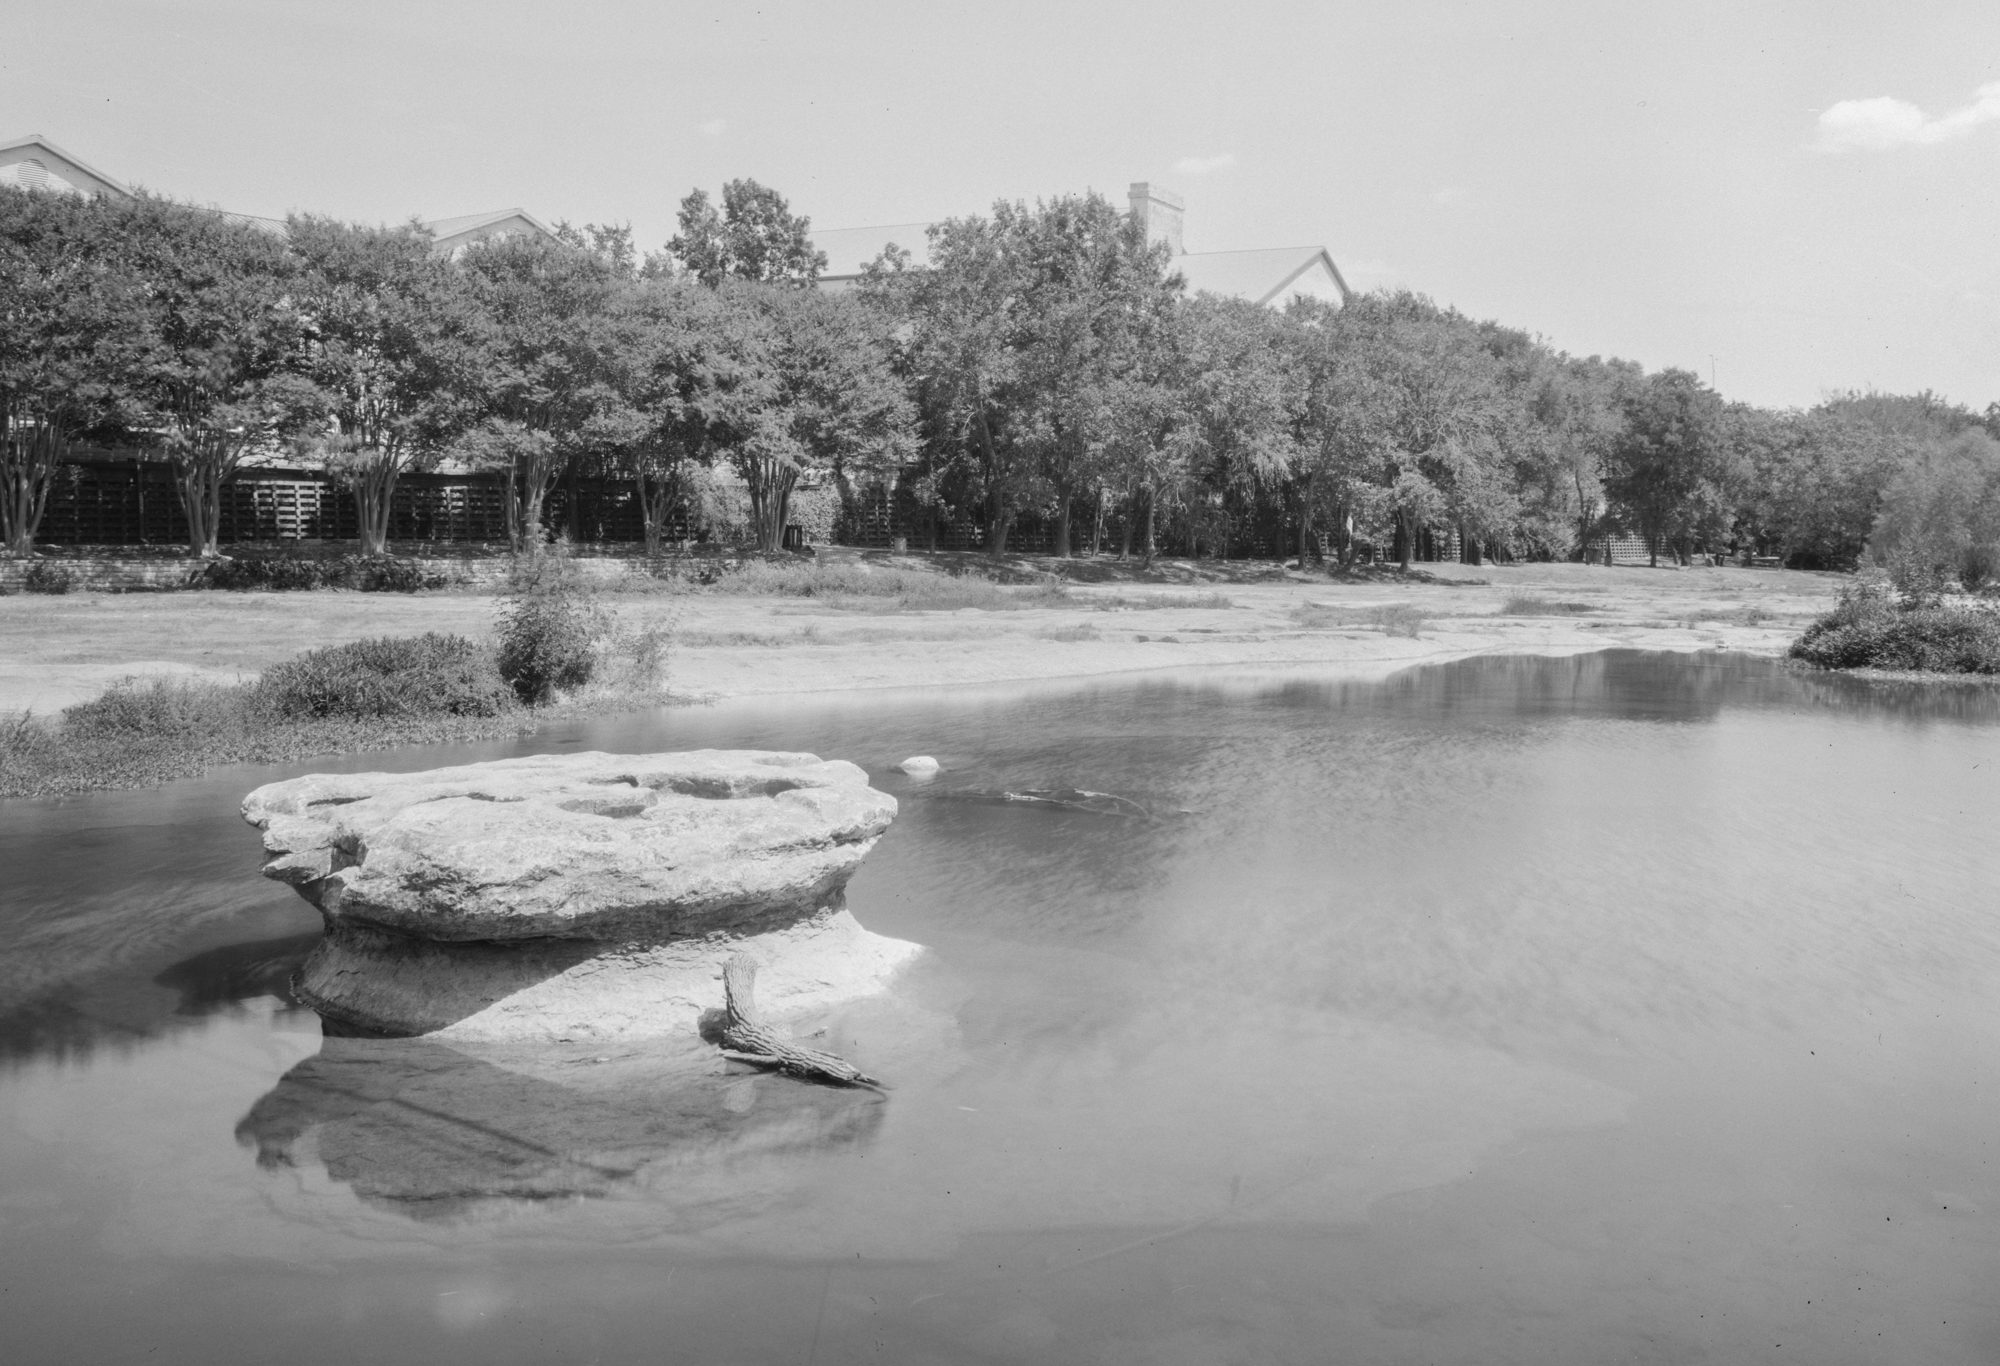 The Round Rock